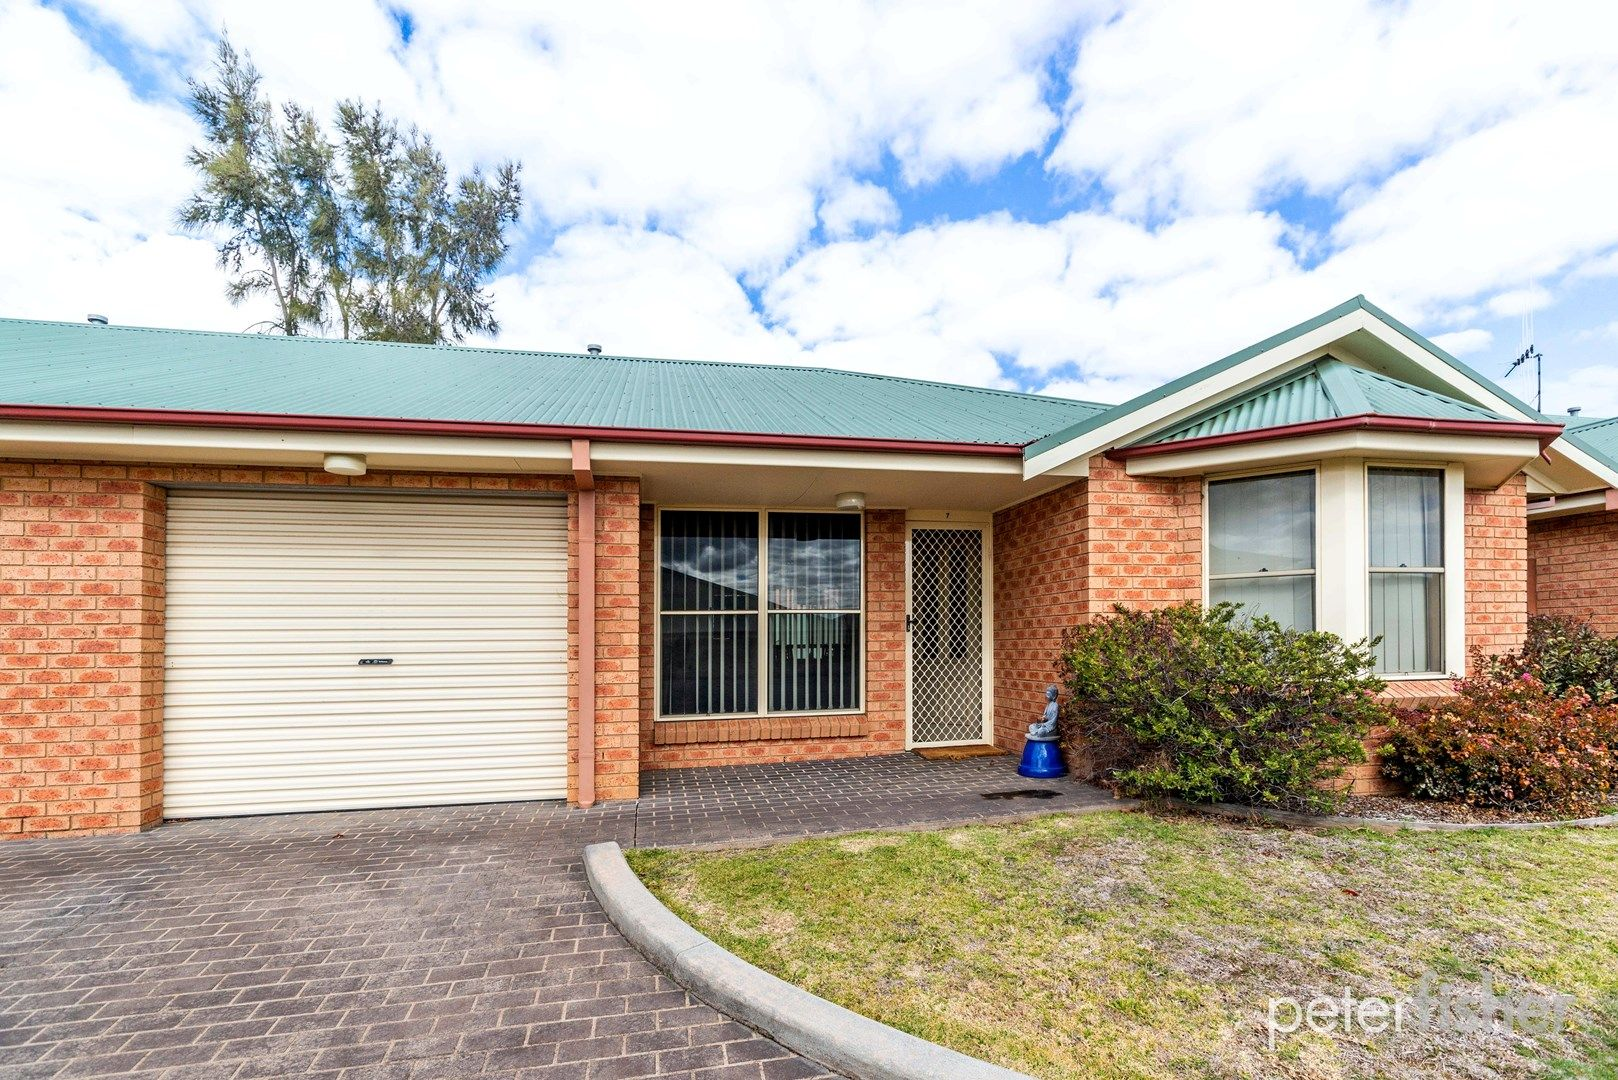 7/189 Clinton Street, Orange NSW 2800, Image 0